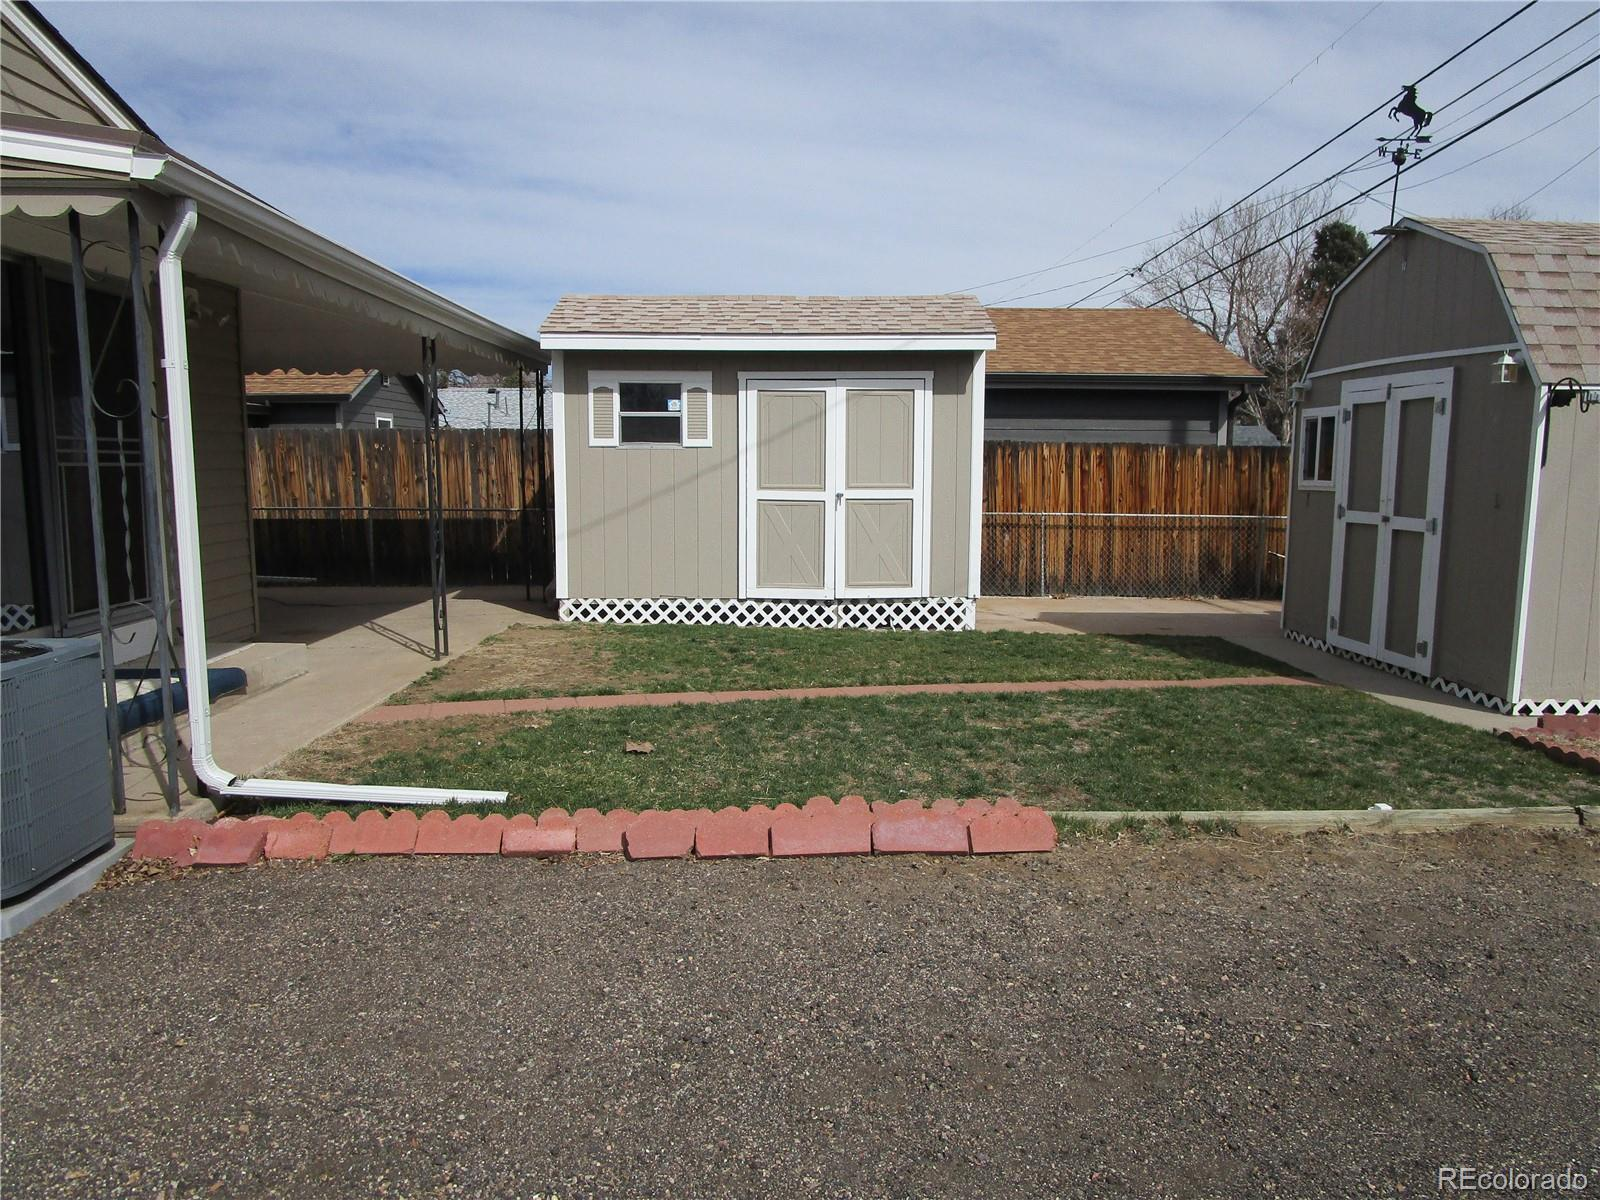 MLS# 5229980 - 25 - 5060 Decatur Street, Denver, CO 80221